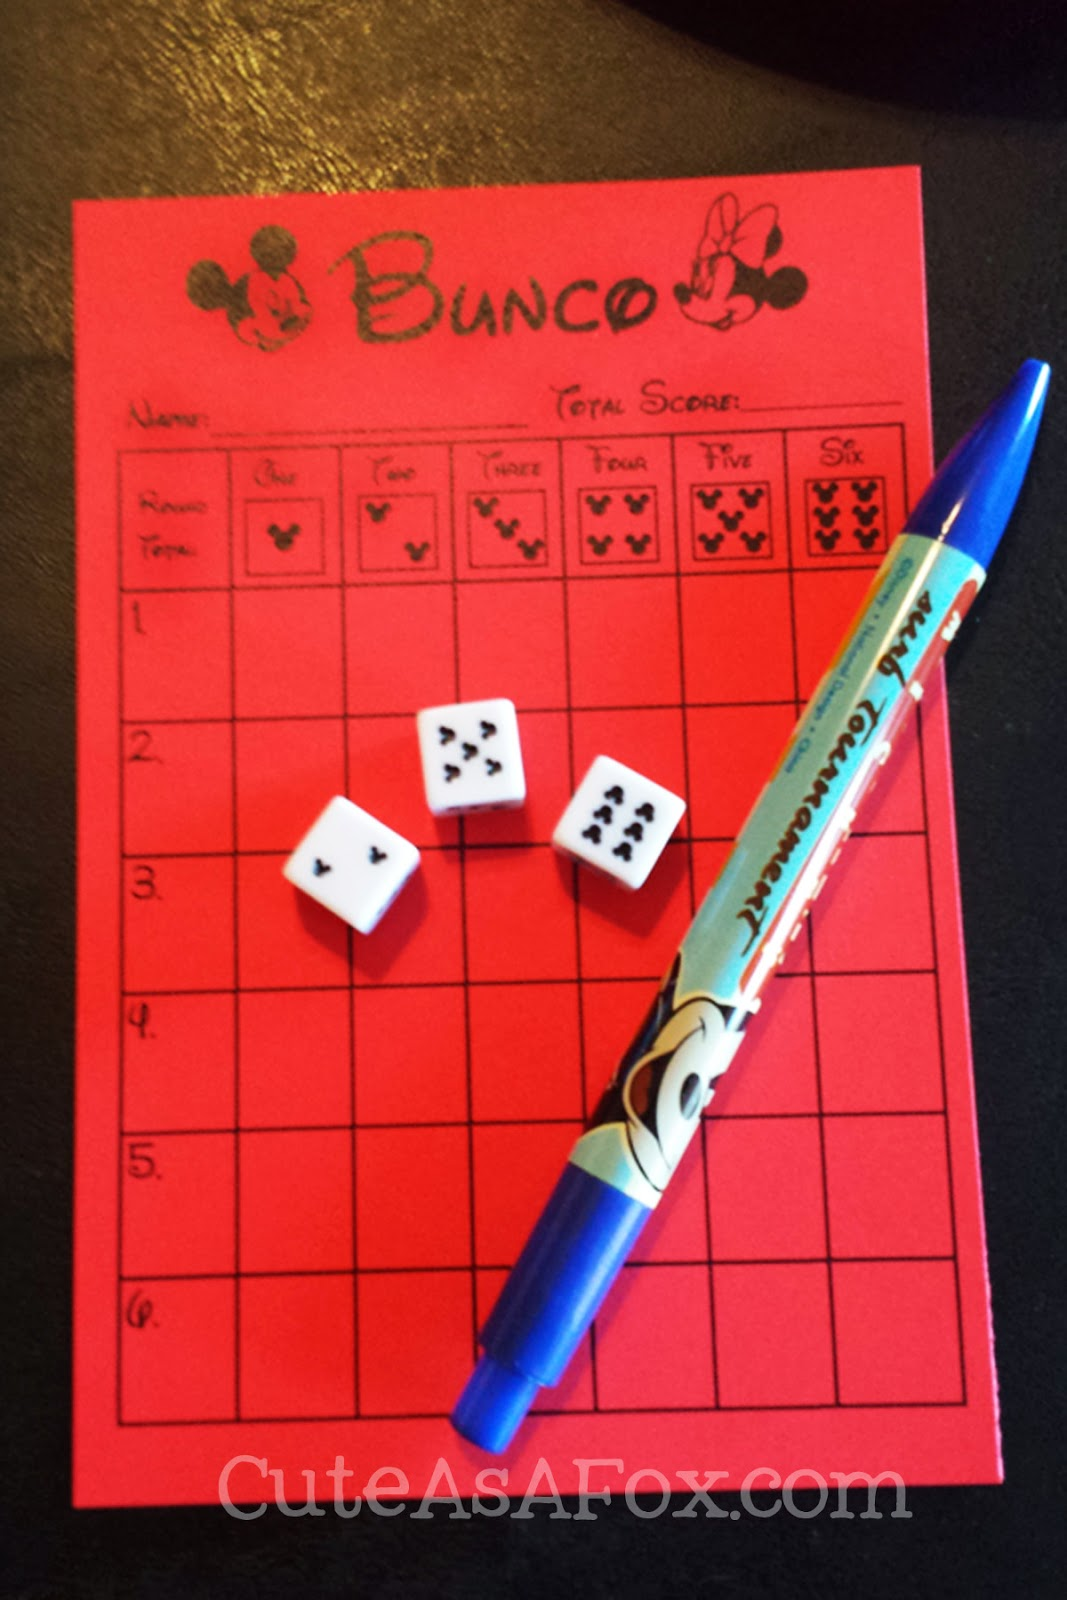 Disney Bunco Printable Scorecards